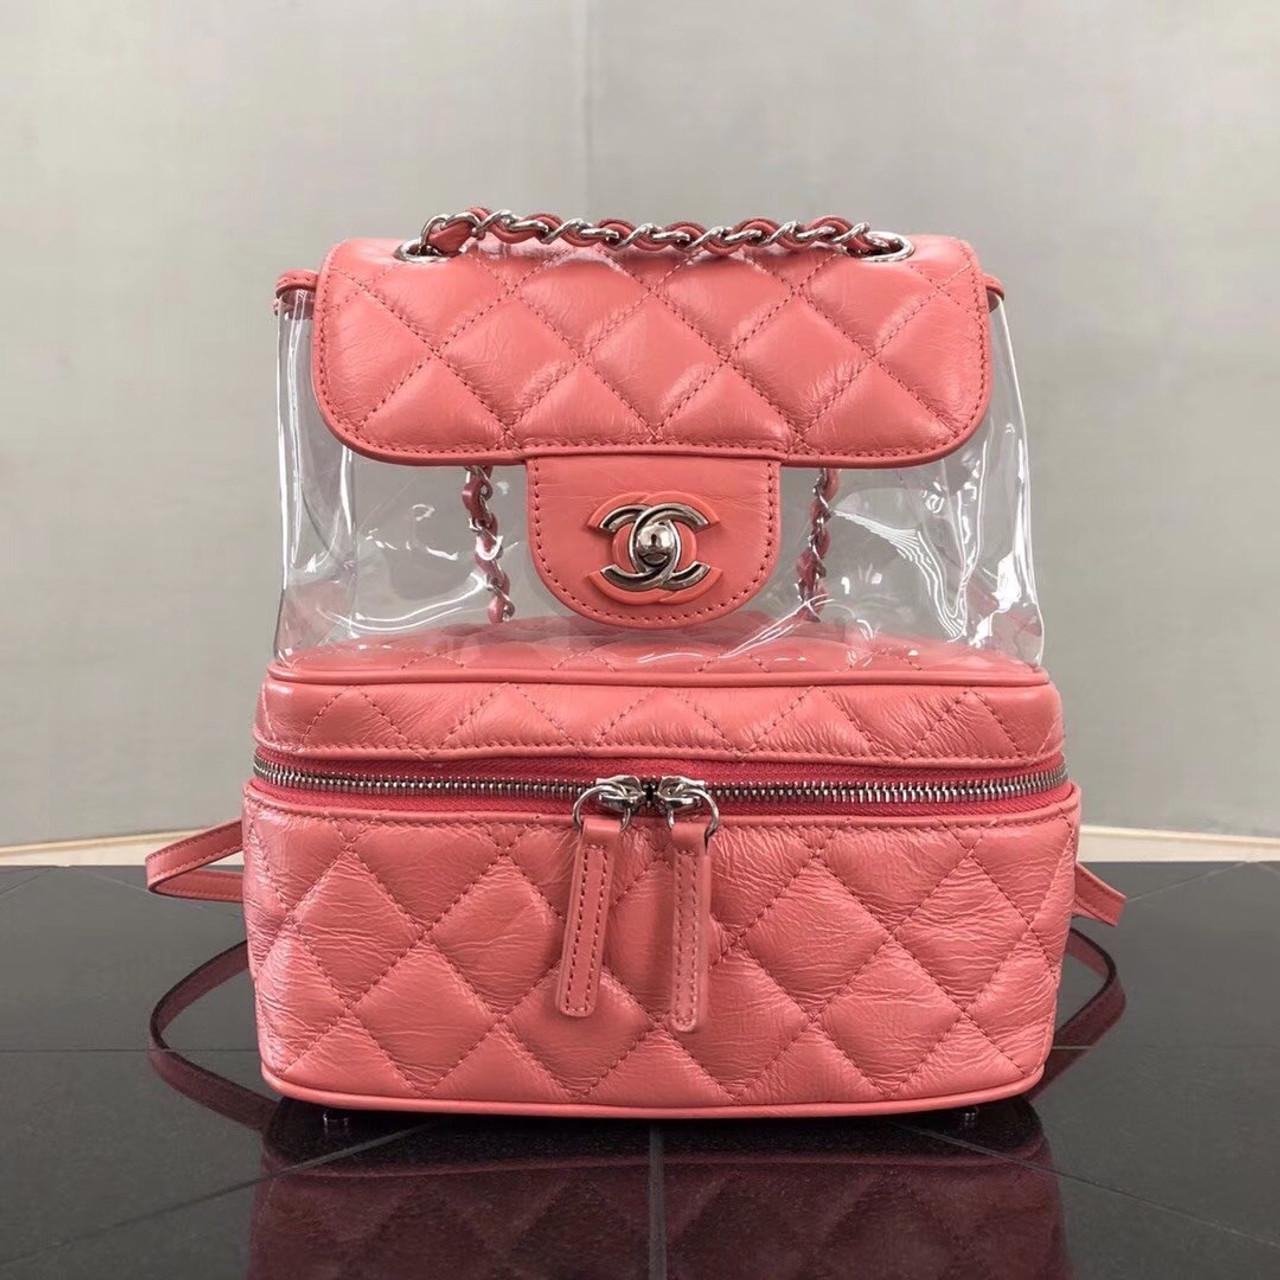 6e164aef9042 Chanel PVC Flap Backpack Pink - Bella Vita Moda